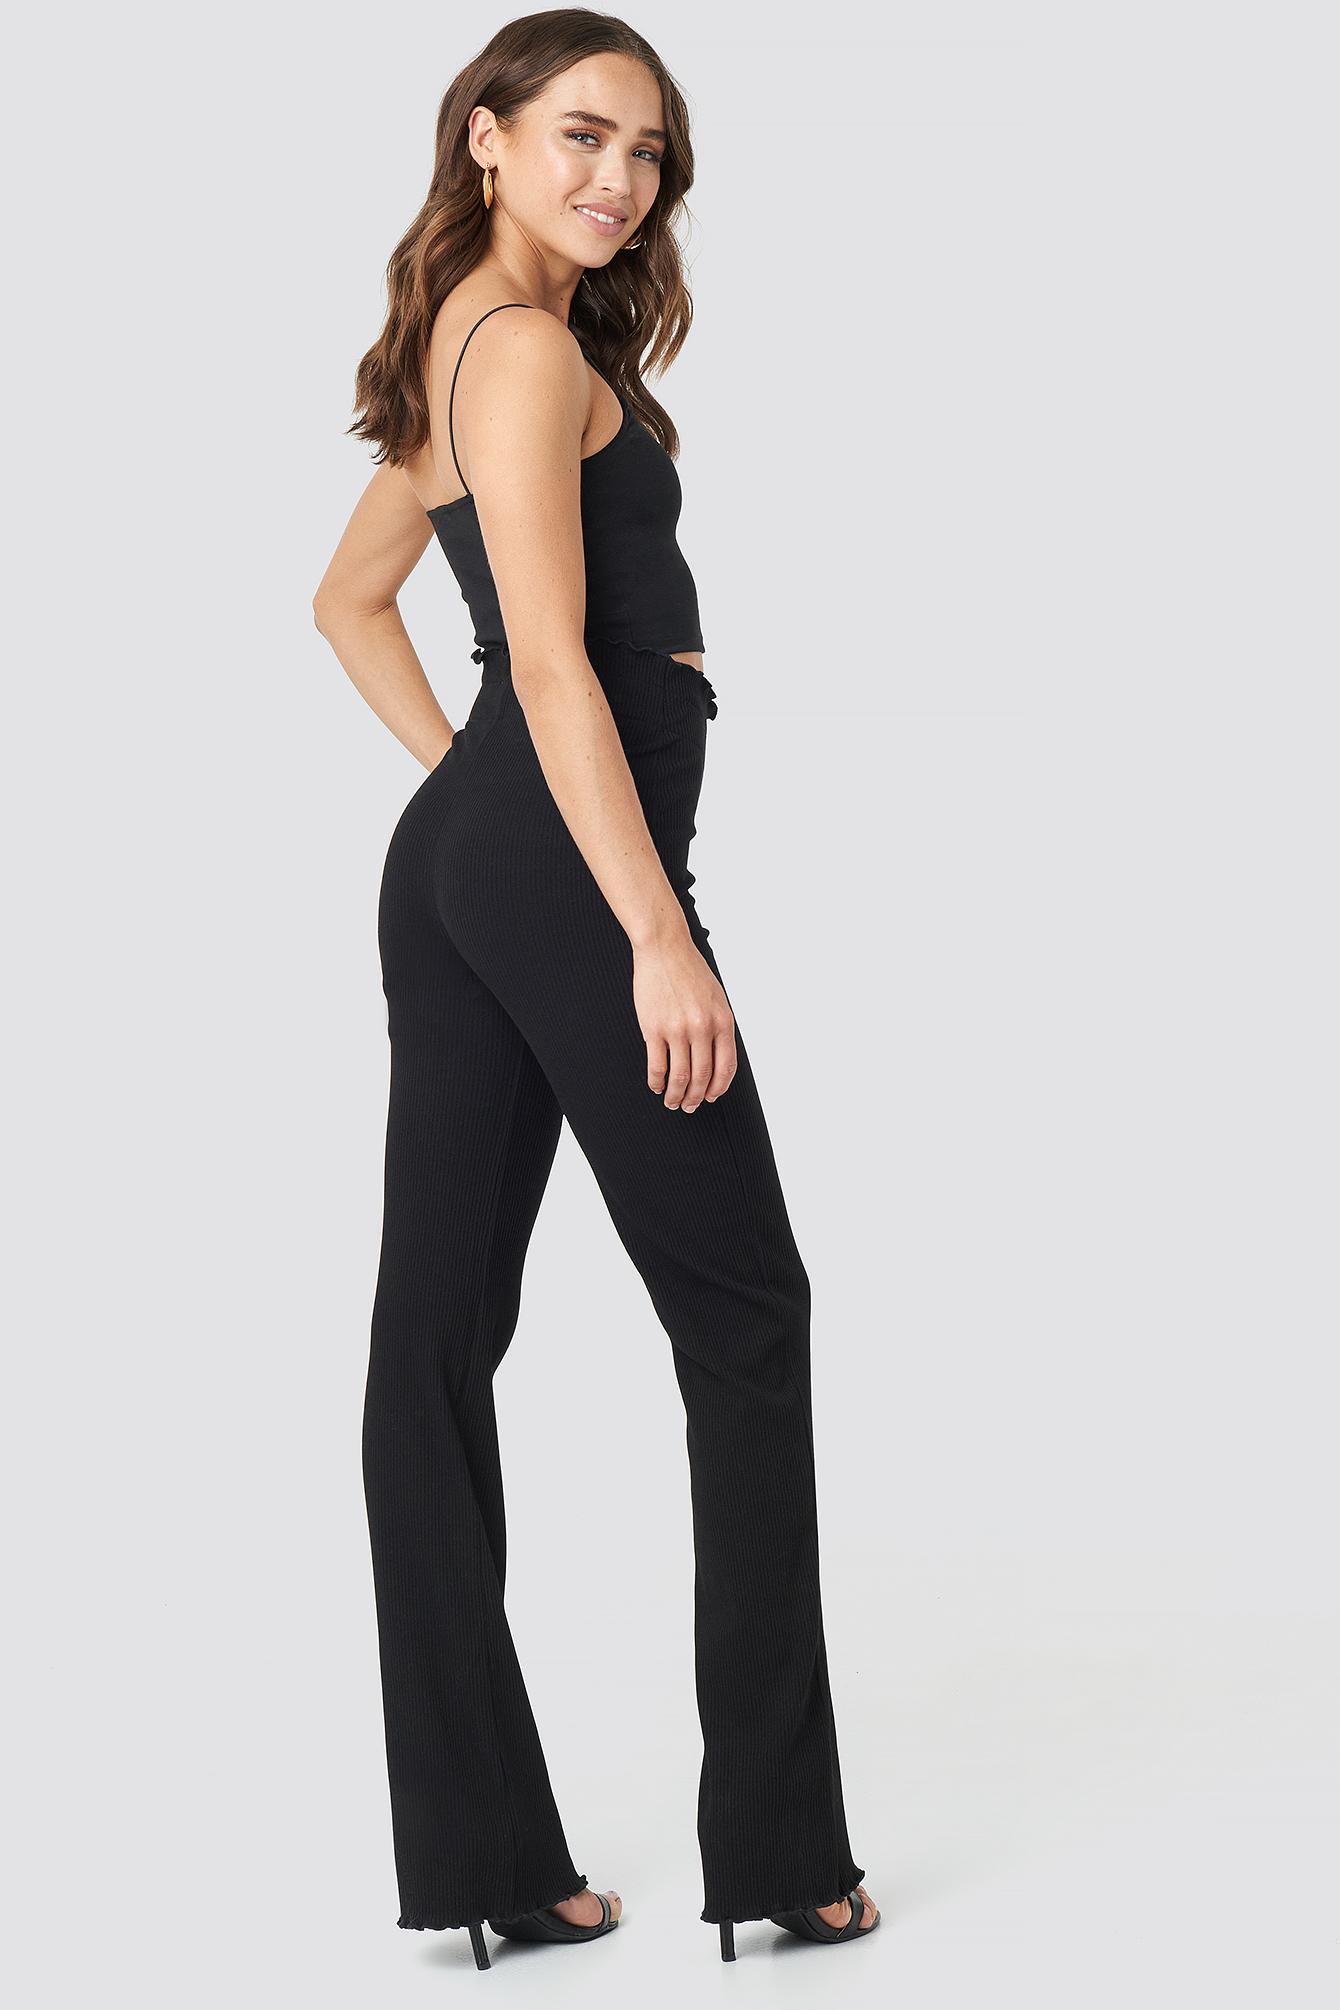 Erica Kvam Ribbed Pants NA-KD.COM